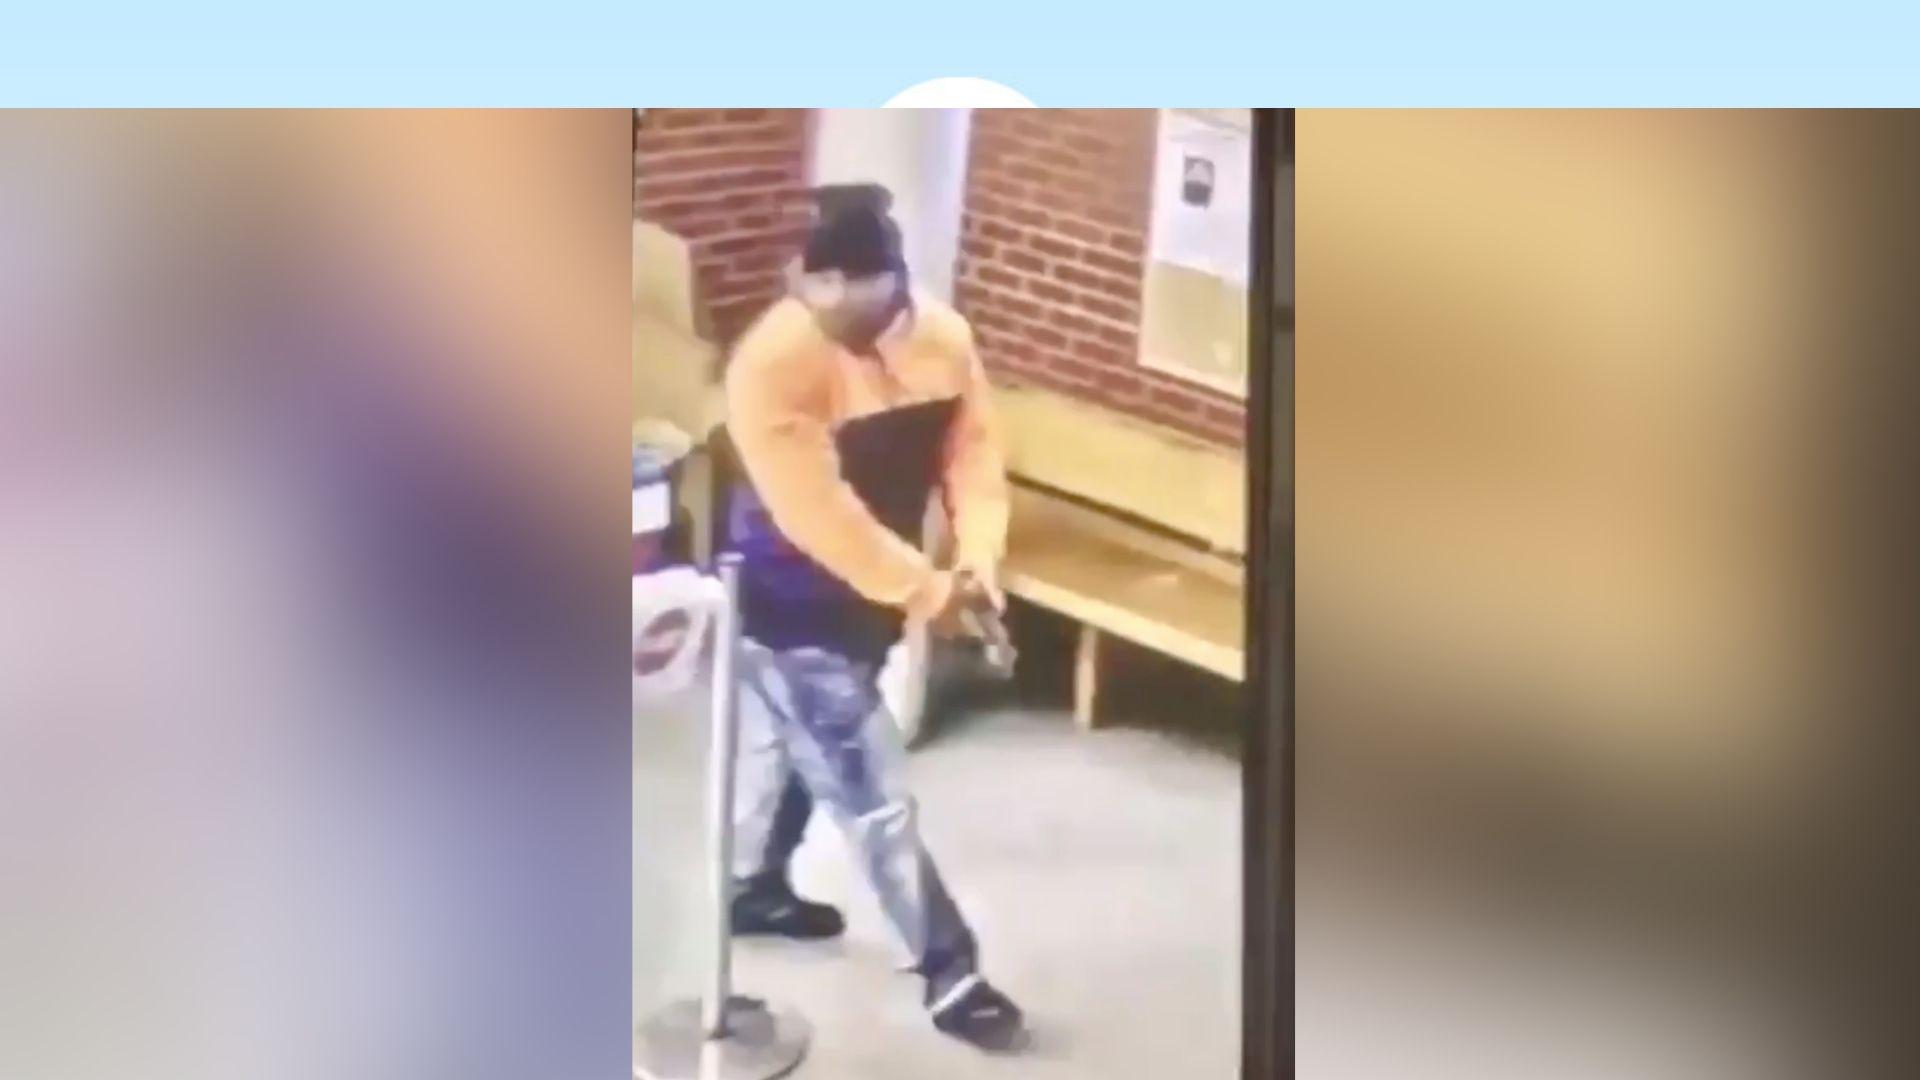 Man opens fire inside 41st precinct in the Bronx, February 9, 2020